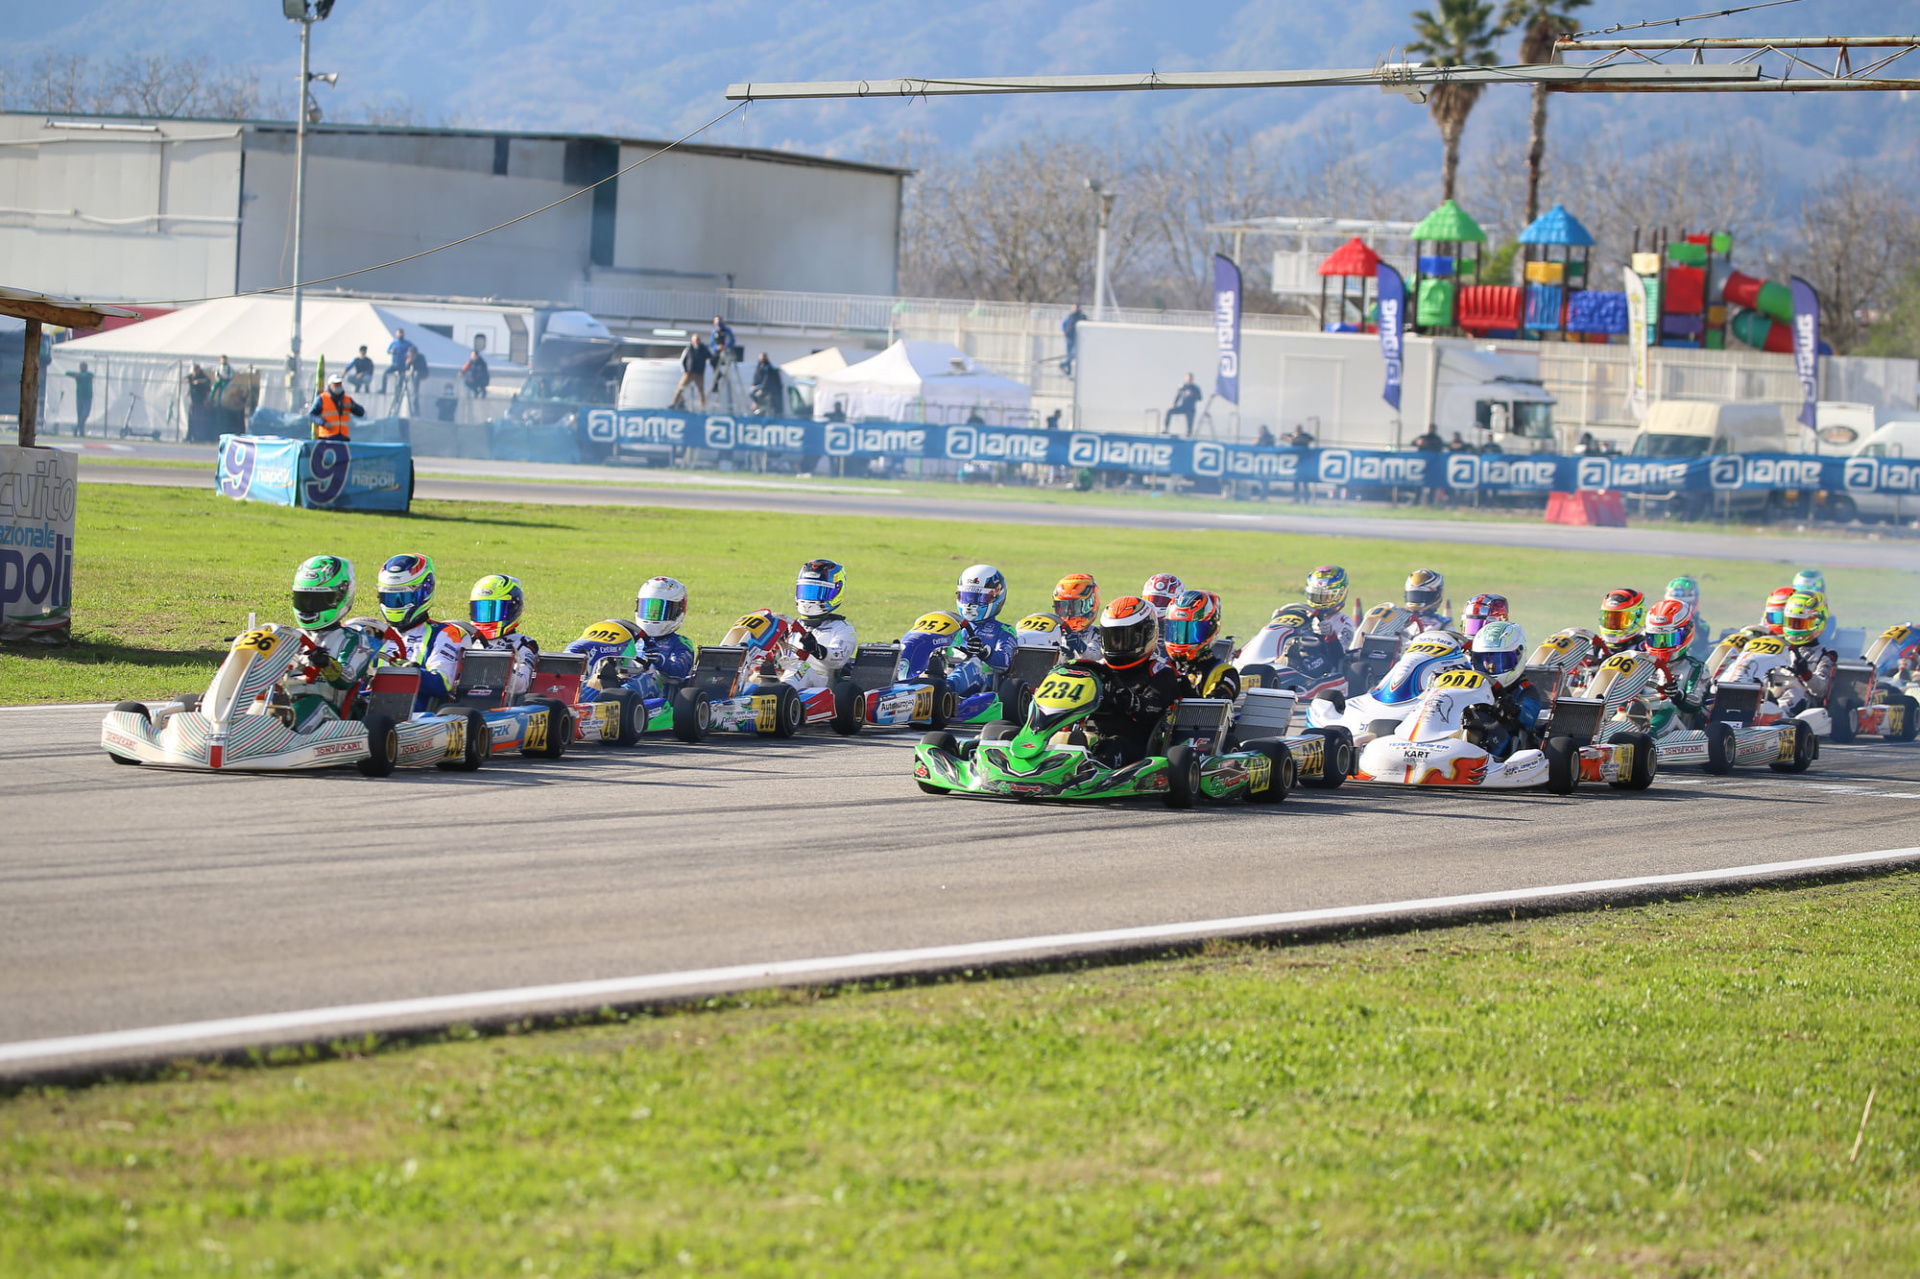 Gamoto Kart ends the season with a podium at the Trofeo Senna